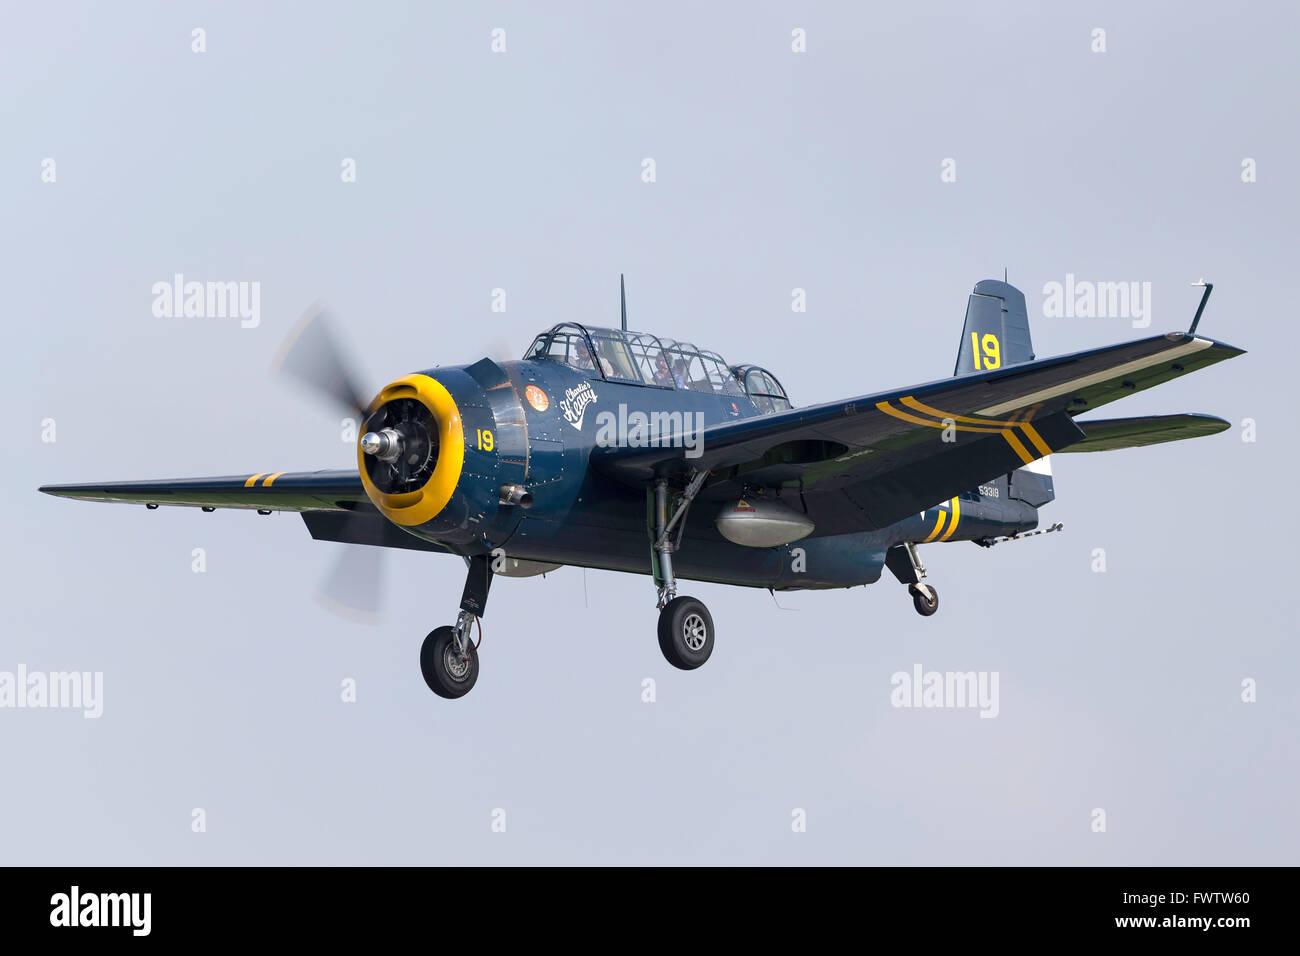 Grumman TBM (TBM-3R) Avenger World War II torpedo bomber aircraft with the civil registration HB-RDG. - Stock Image